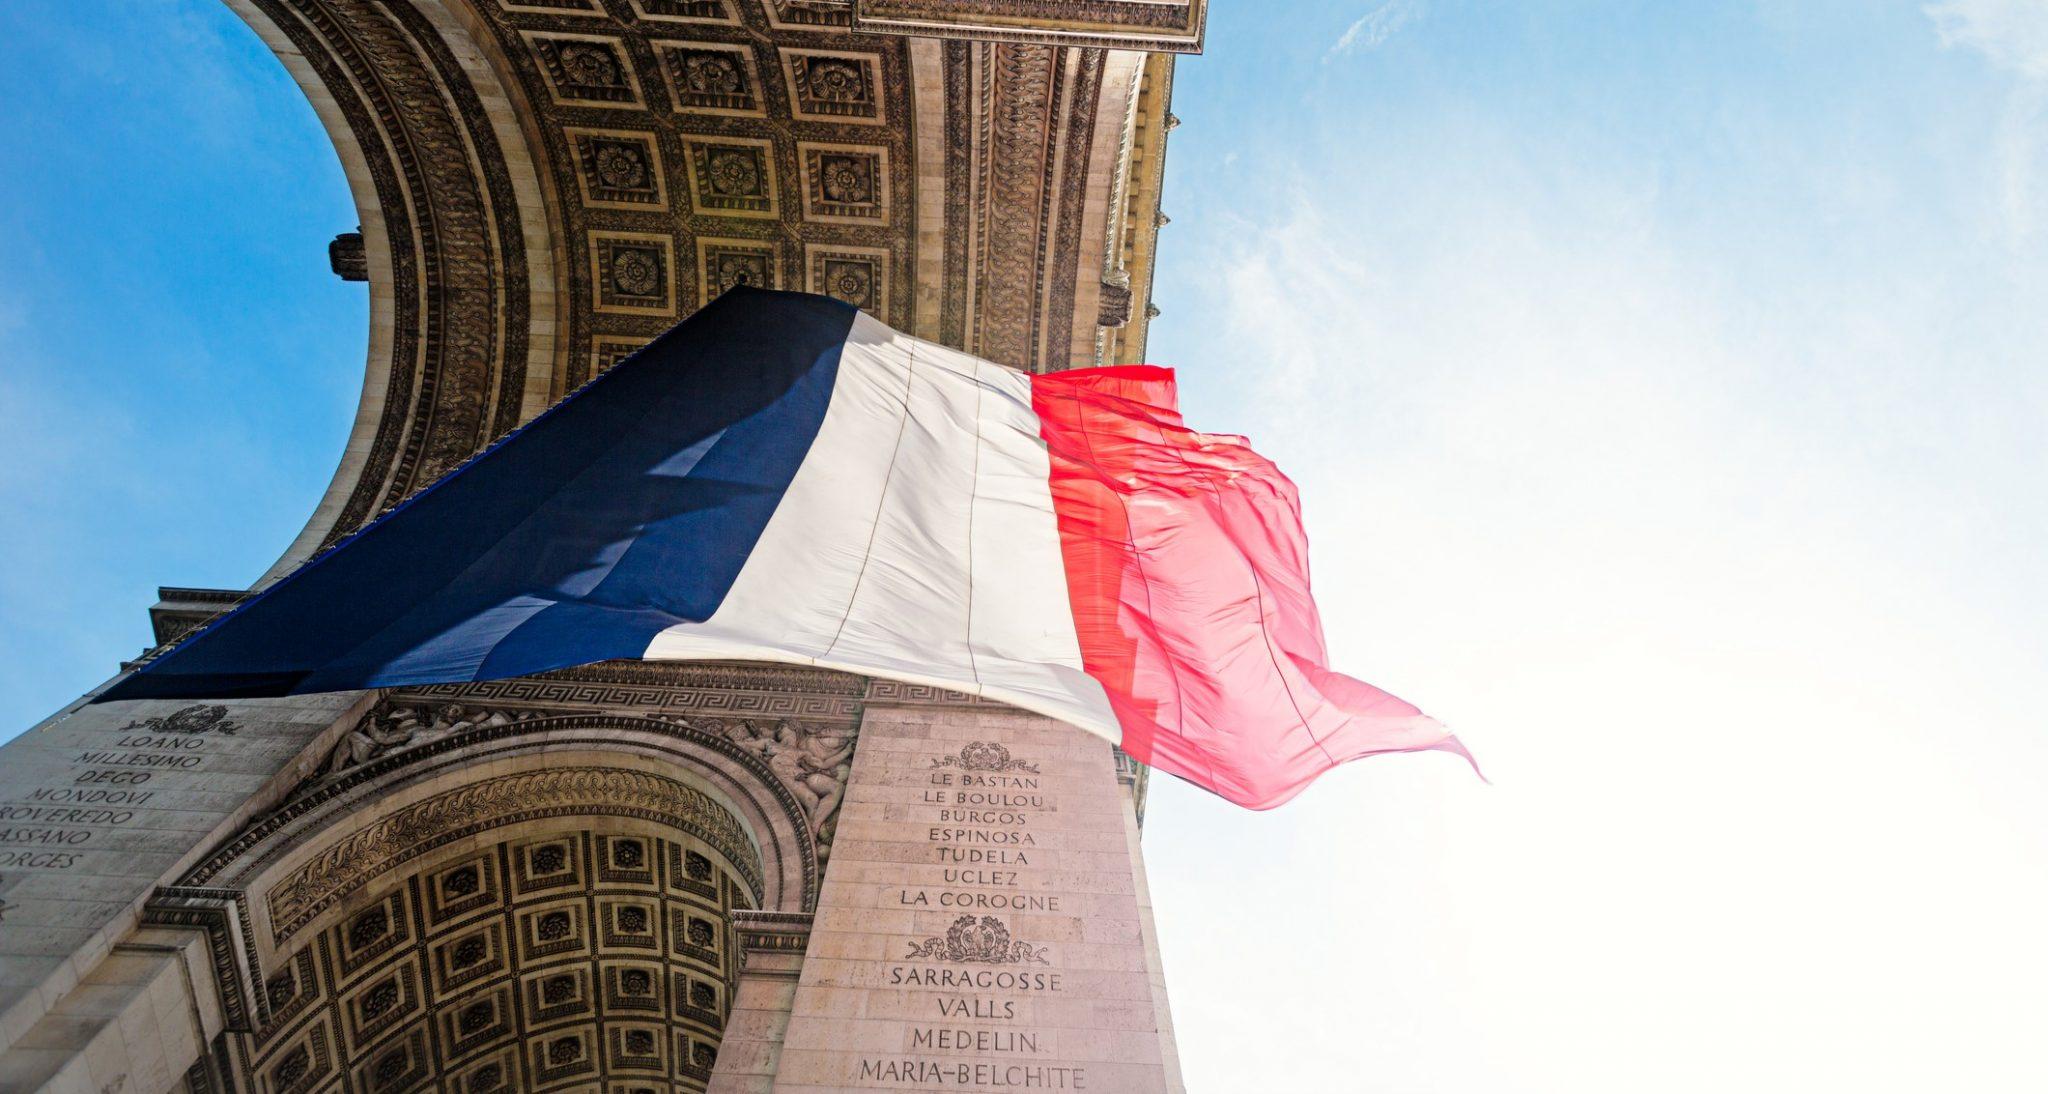 Arc De Triomphe In The Charles De Gaulle Square